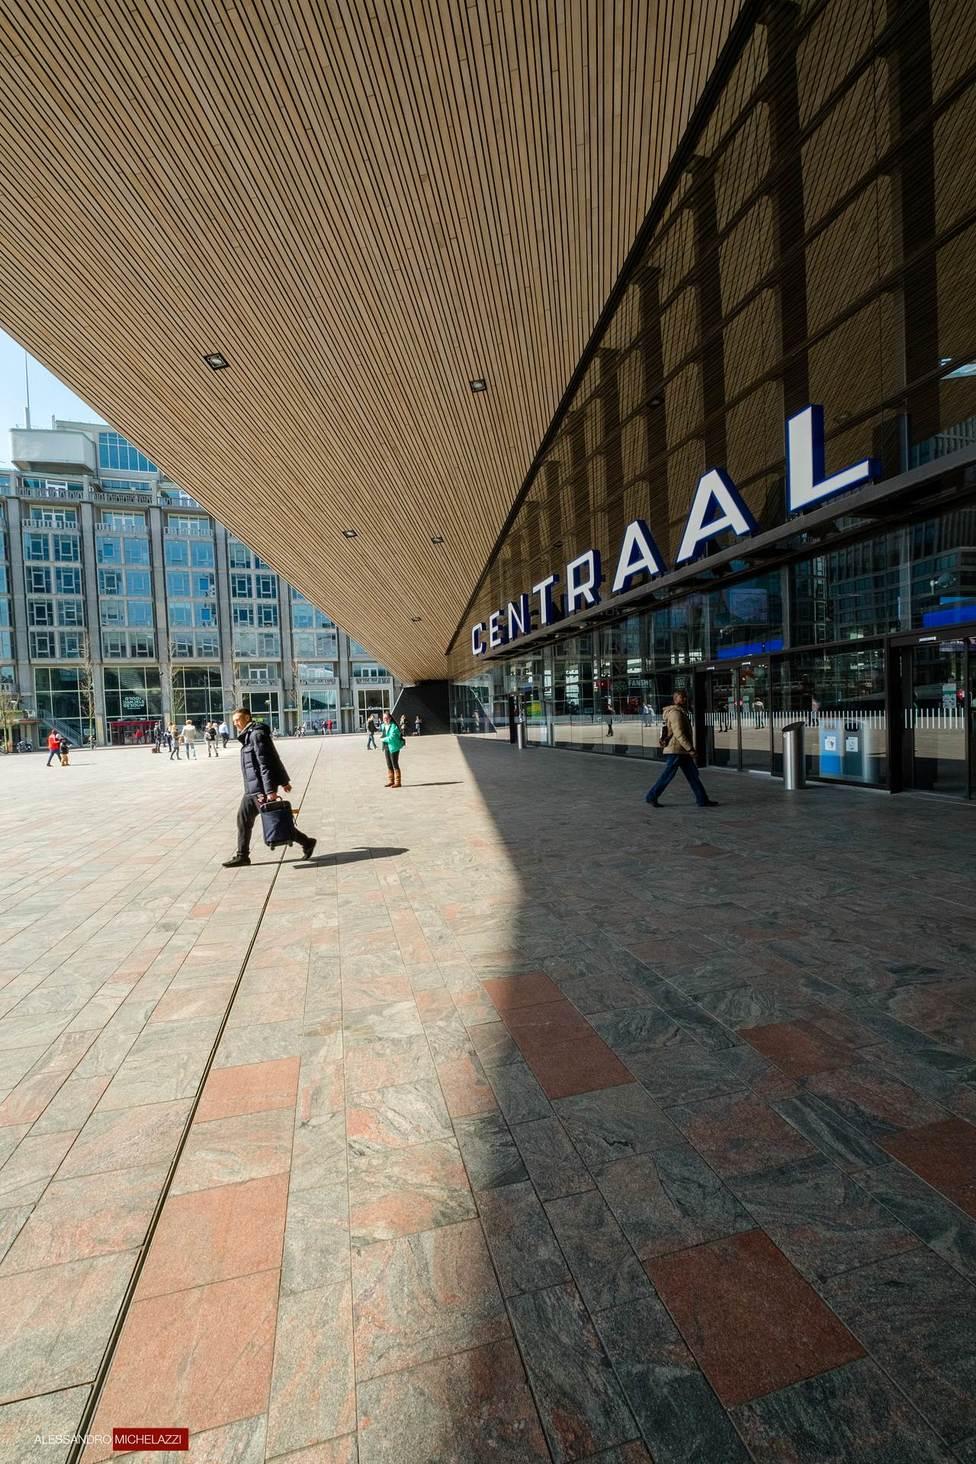 Rotterdam-Photography-Alessandro-Michelazzi-15